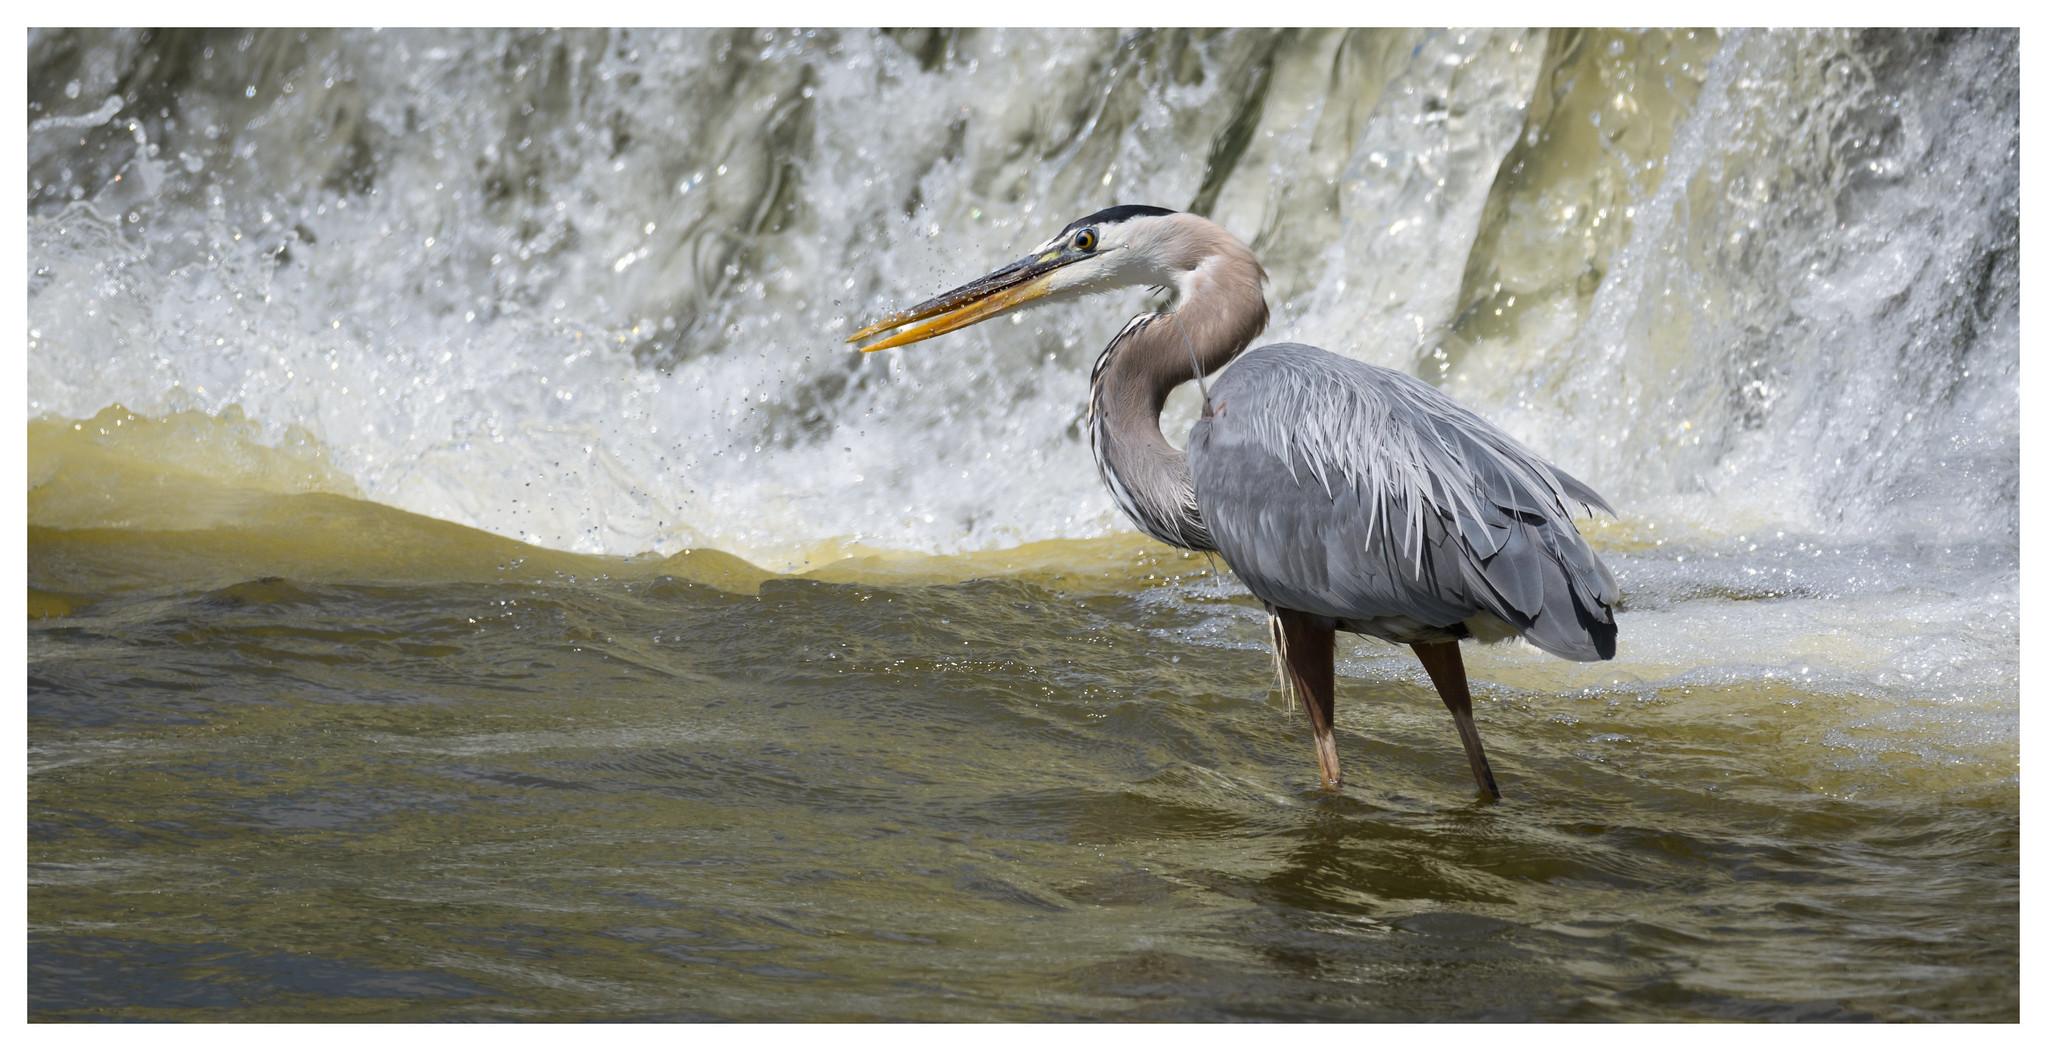 Great Blue Heron at Deeds Spillway.